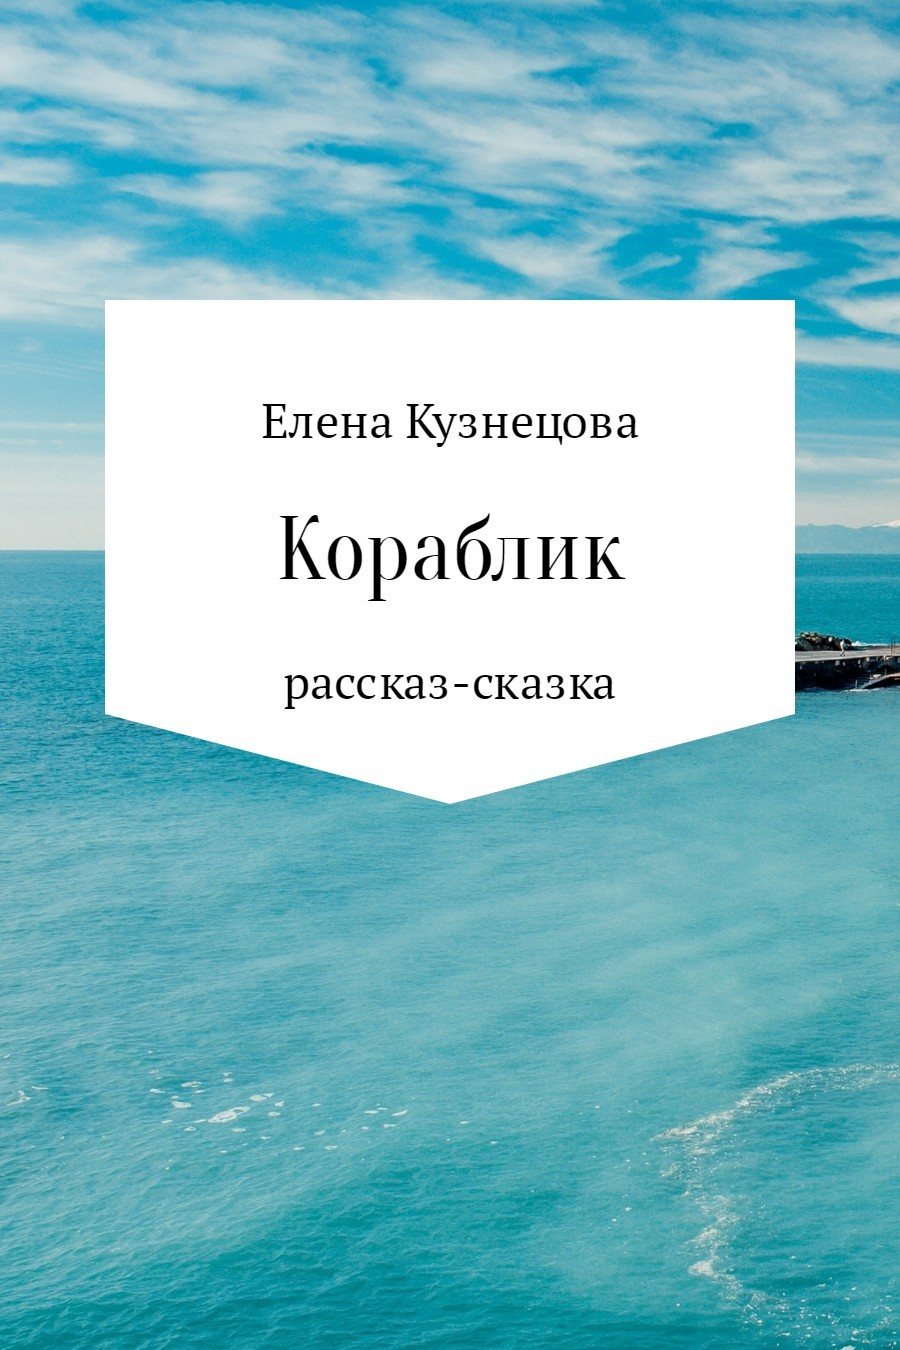 Елена Кузнецова - Кораблик